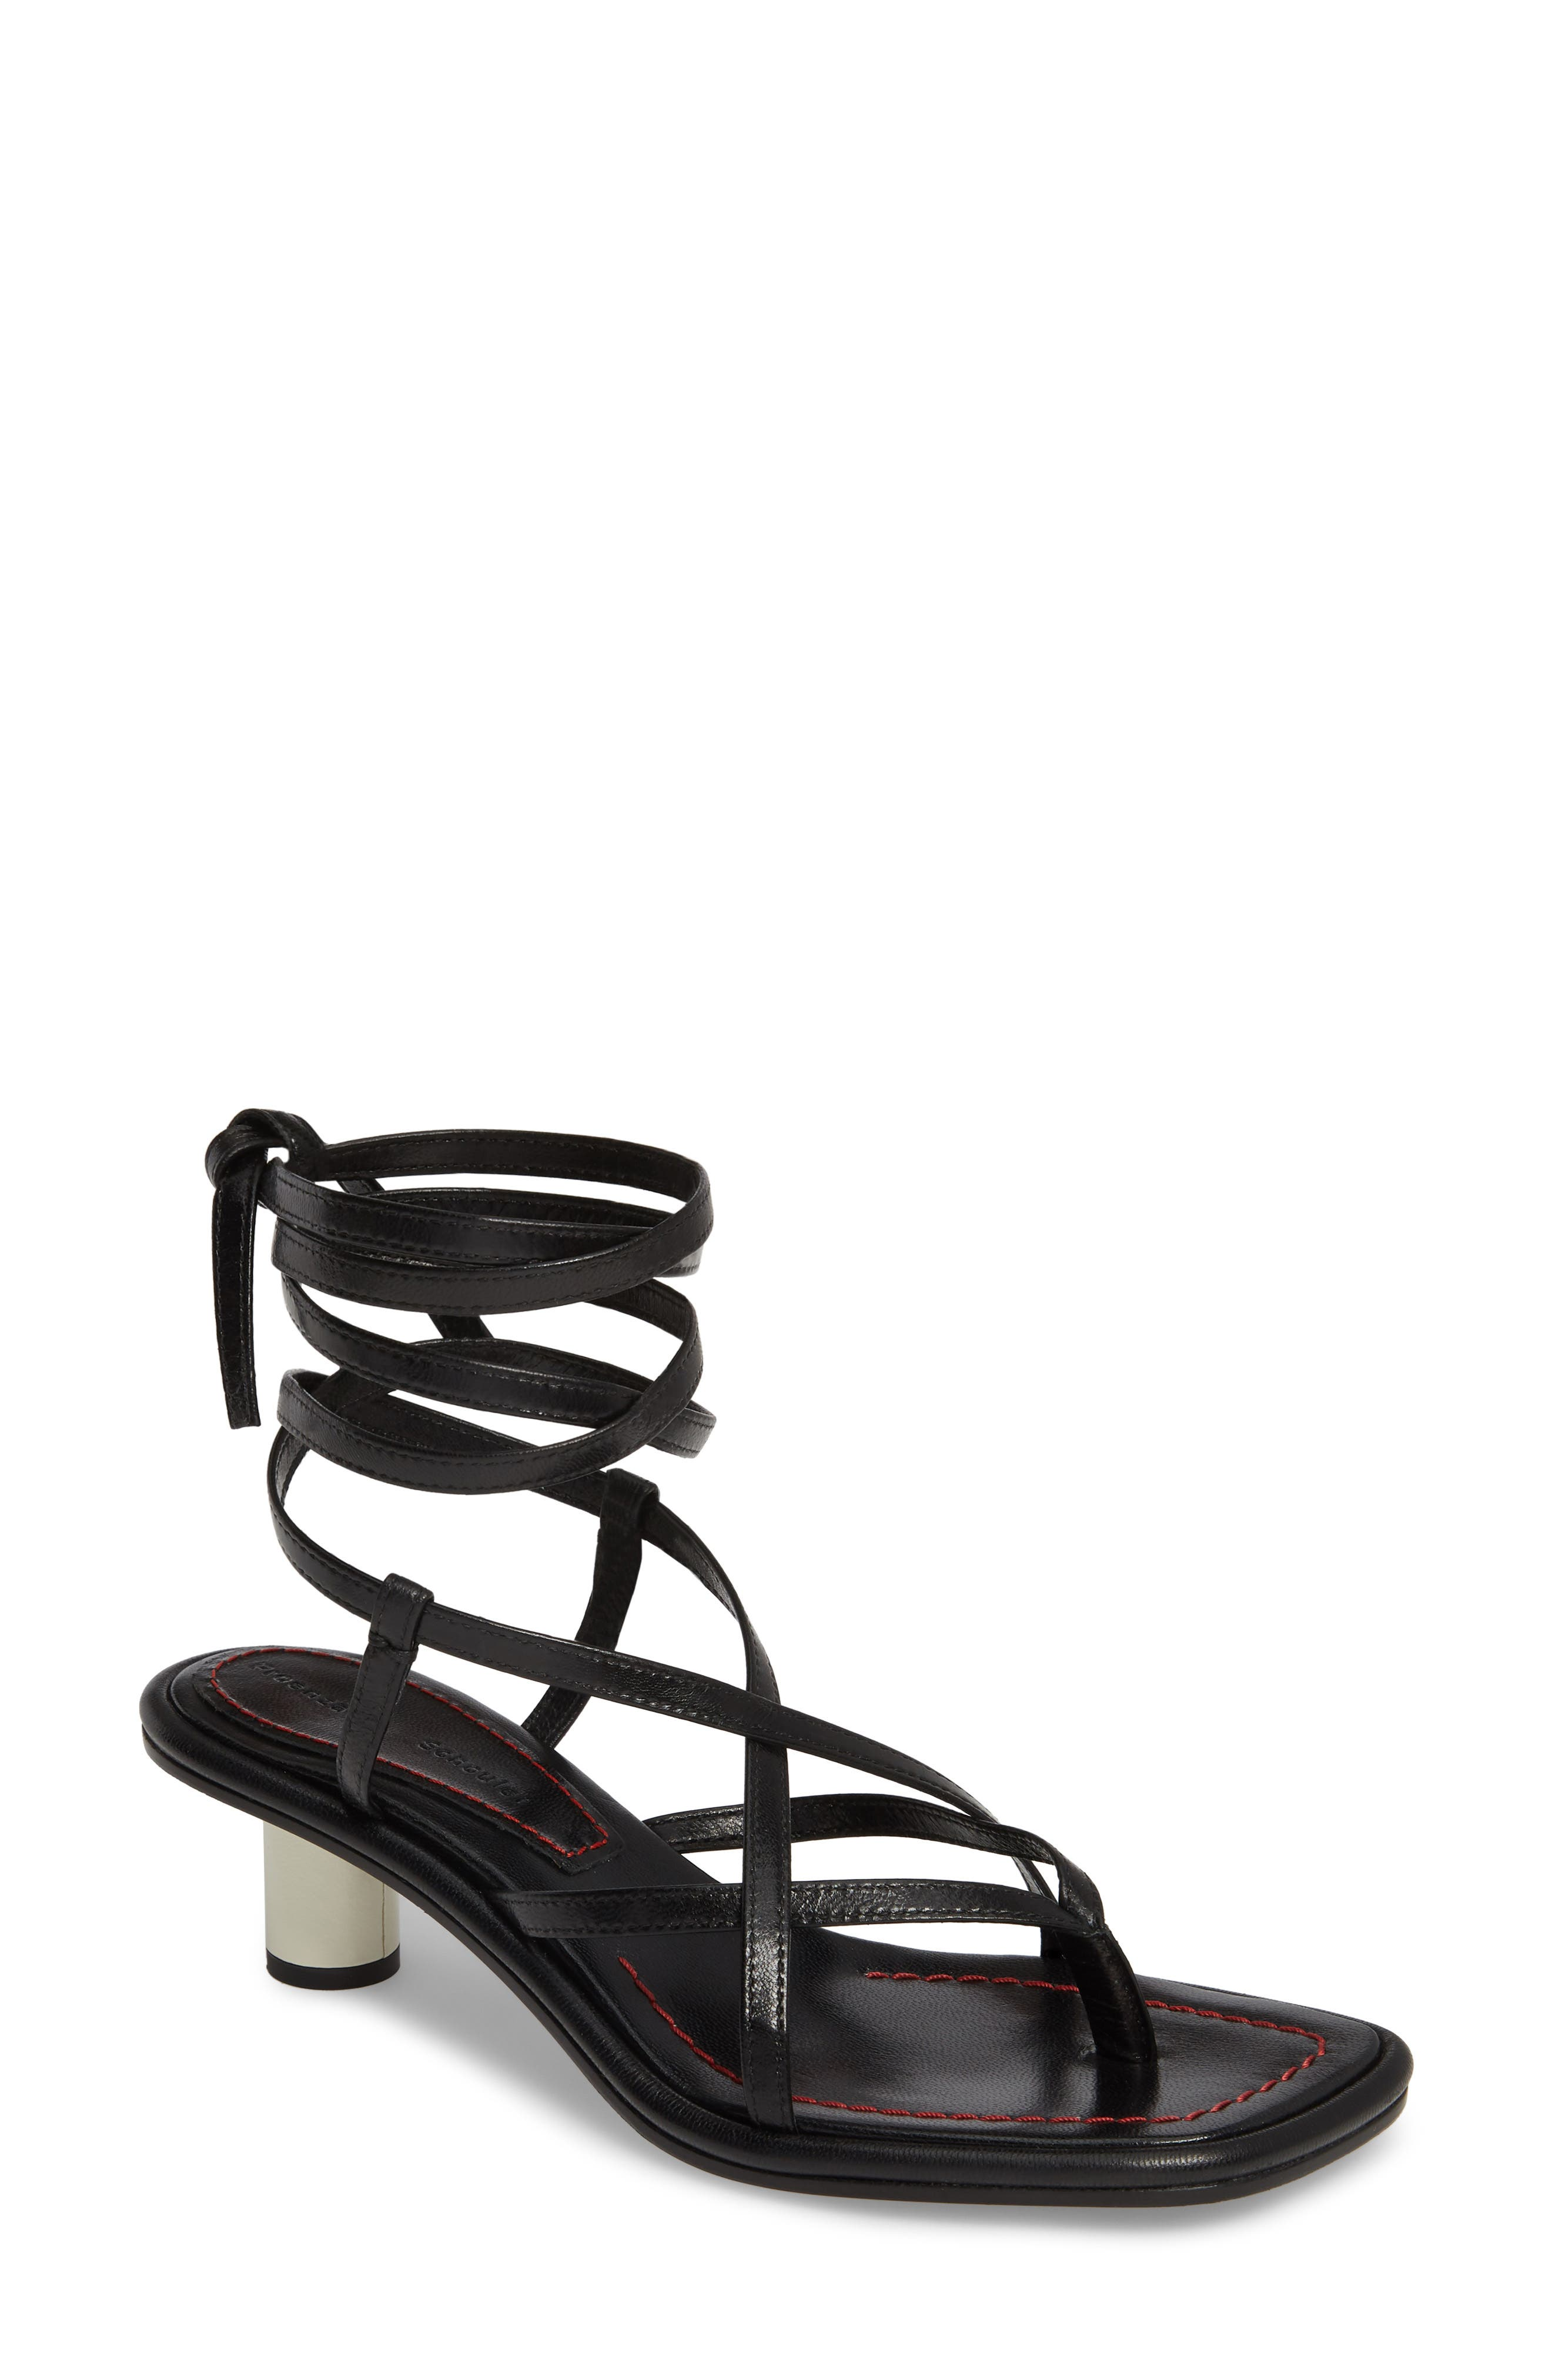 Proenza Schouler Wraparound Ankle Strap Sandal - Black